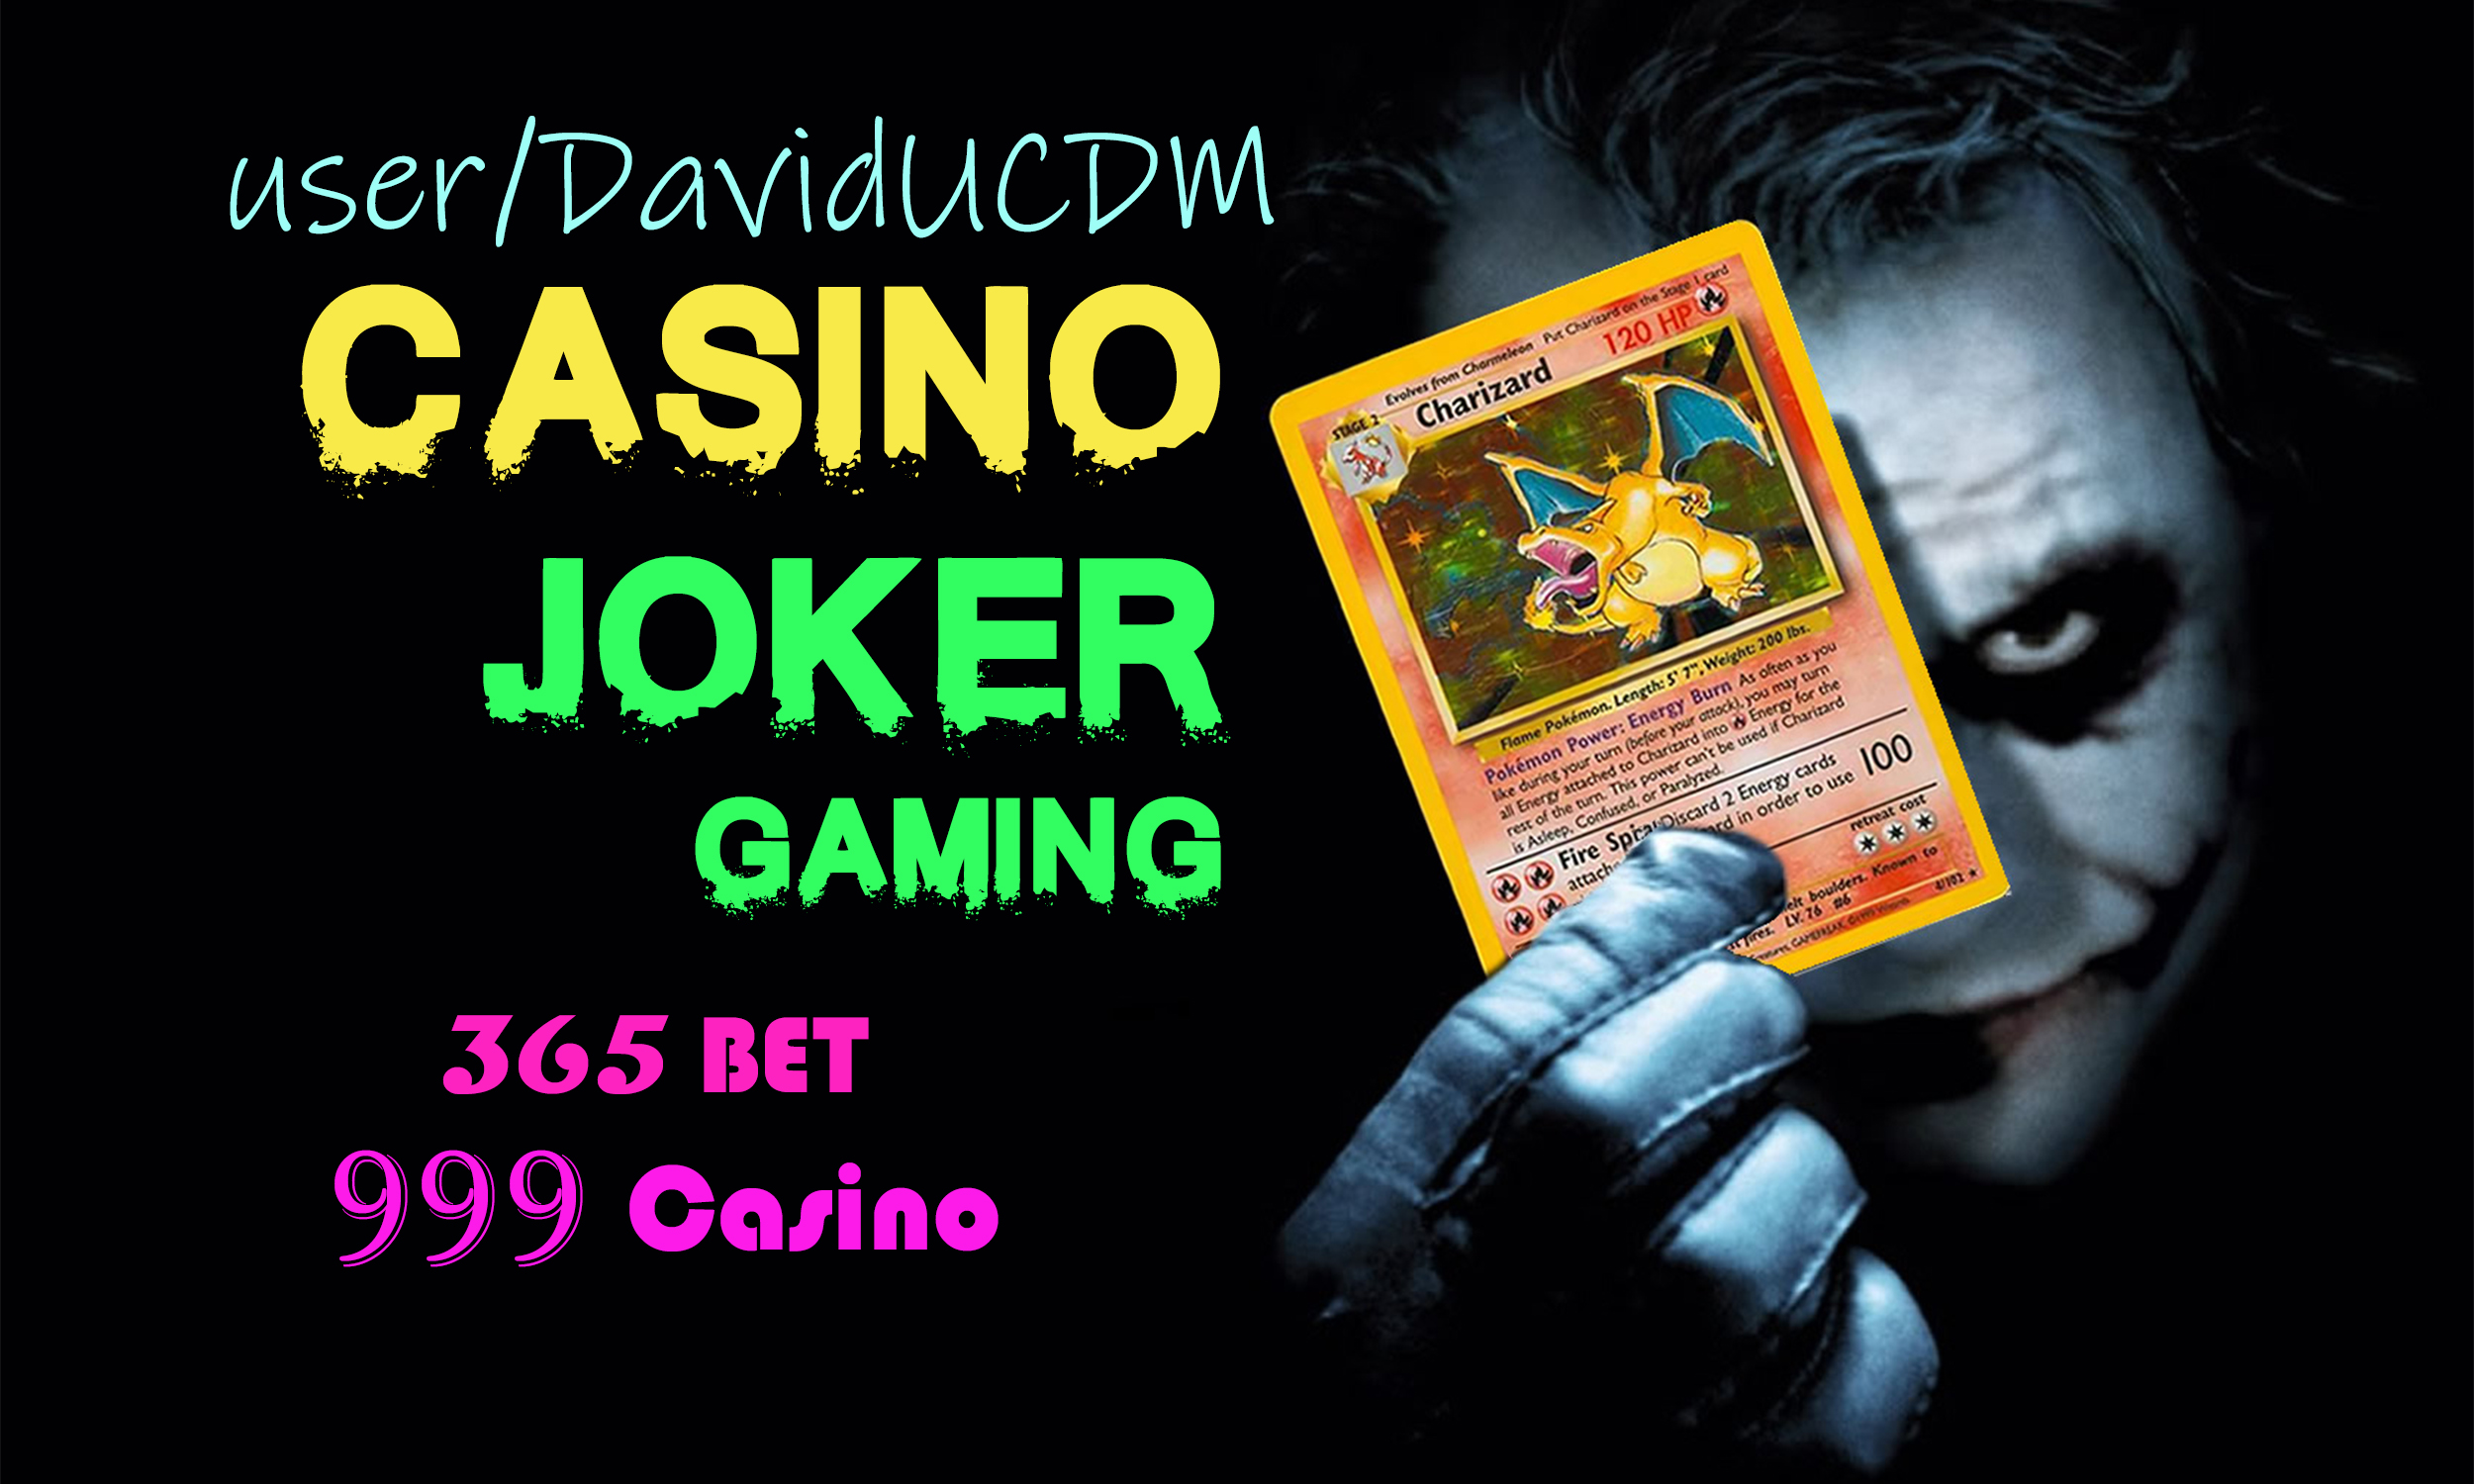 Buy 1 Get Bonus 1 Casino,  Poker, gambling,  UfaBET,  999 Gaming,  Judi Related 499+ PBNs Backlinks